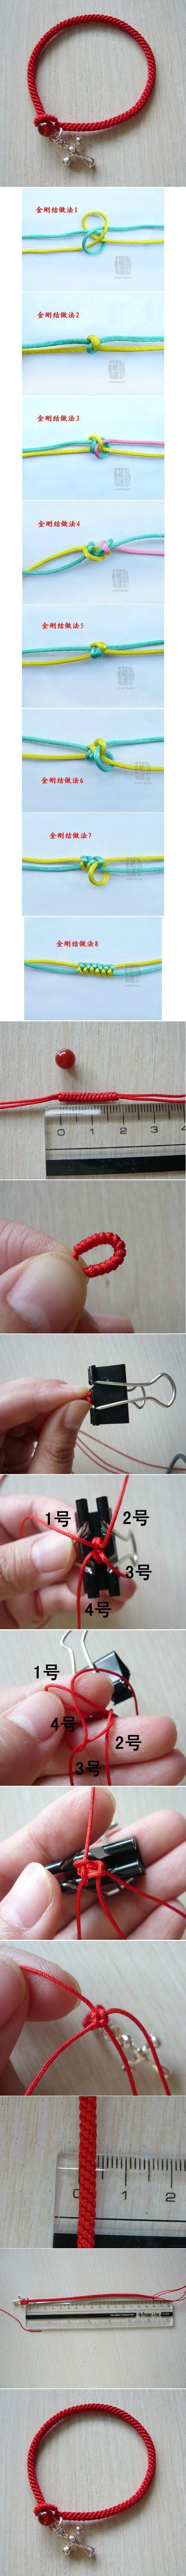 DIY Easy Chinese Knot Bracelet DIY Projects / UsefulDIY.com